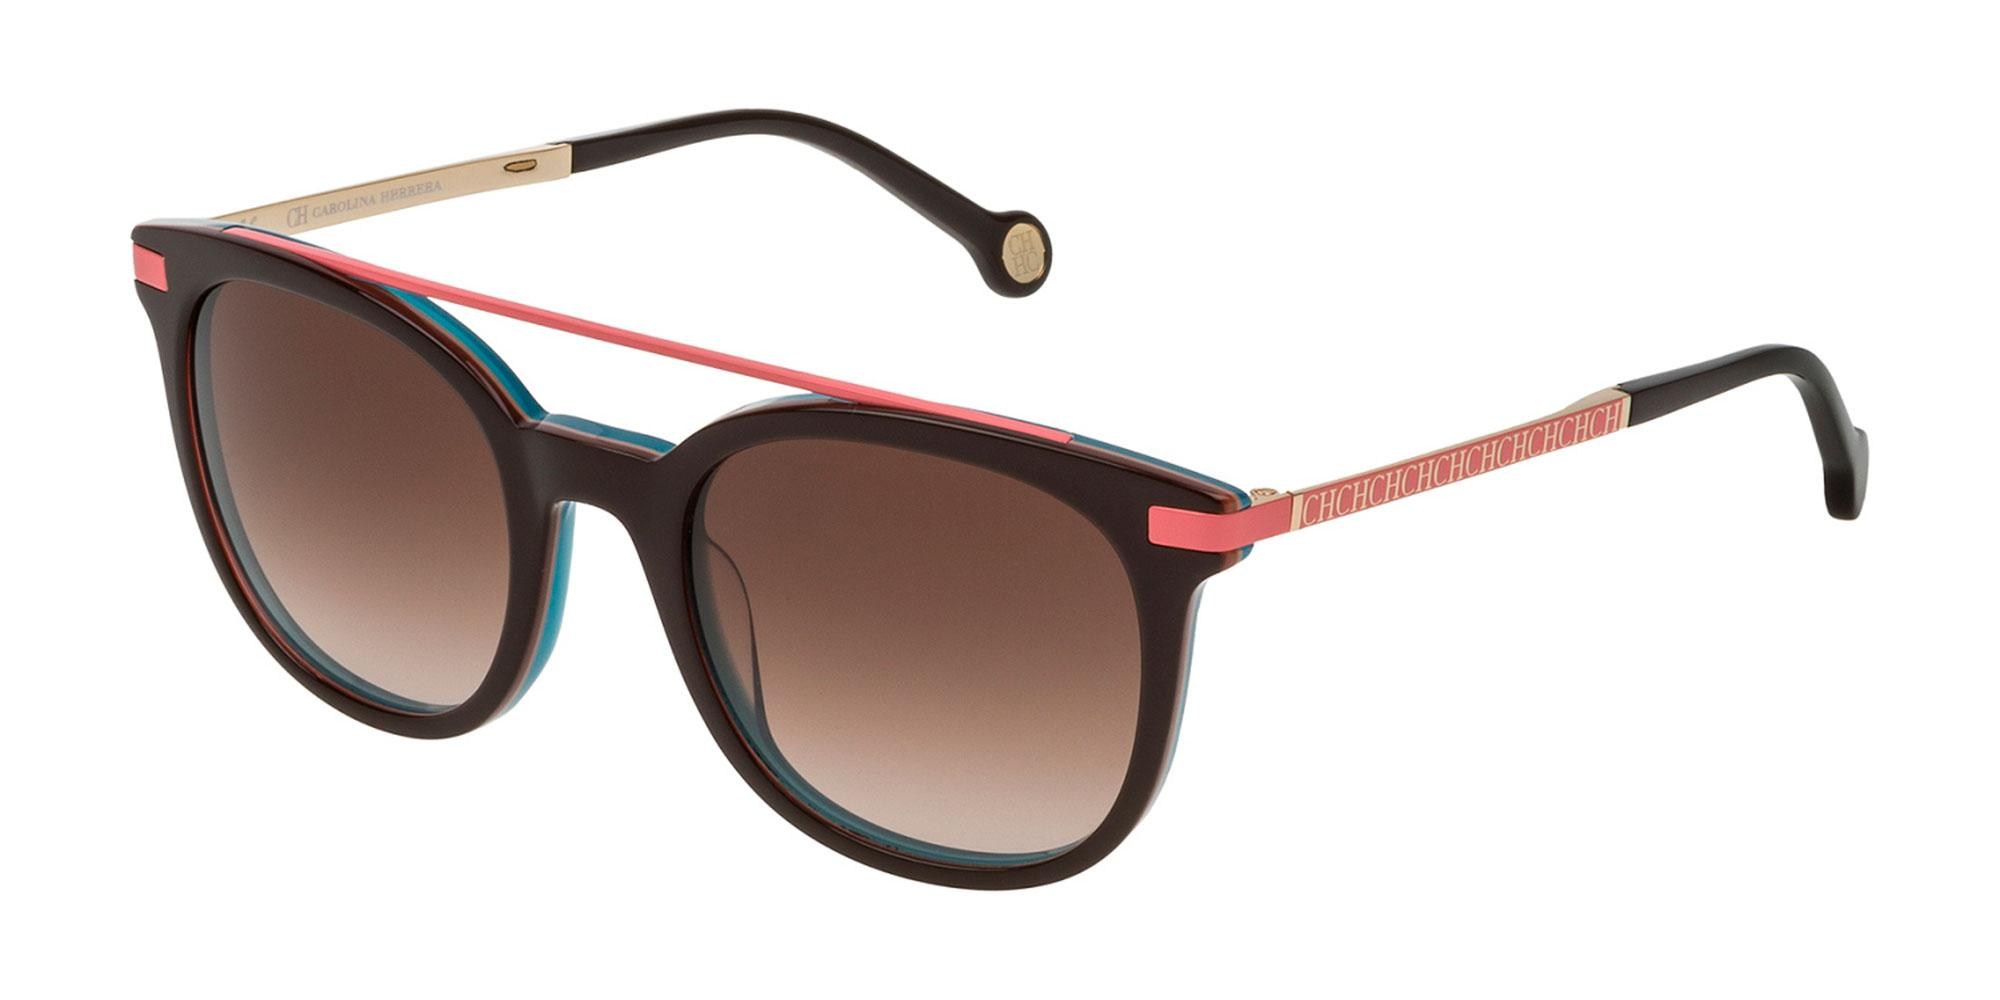 01BA SHE690 Sunglasses, CH Carolina Herrera